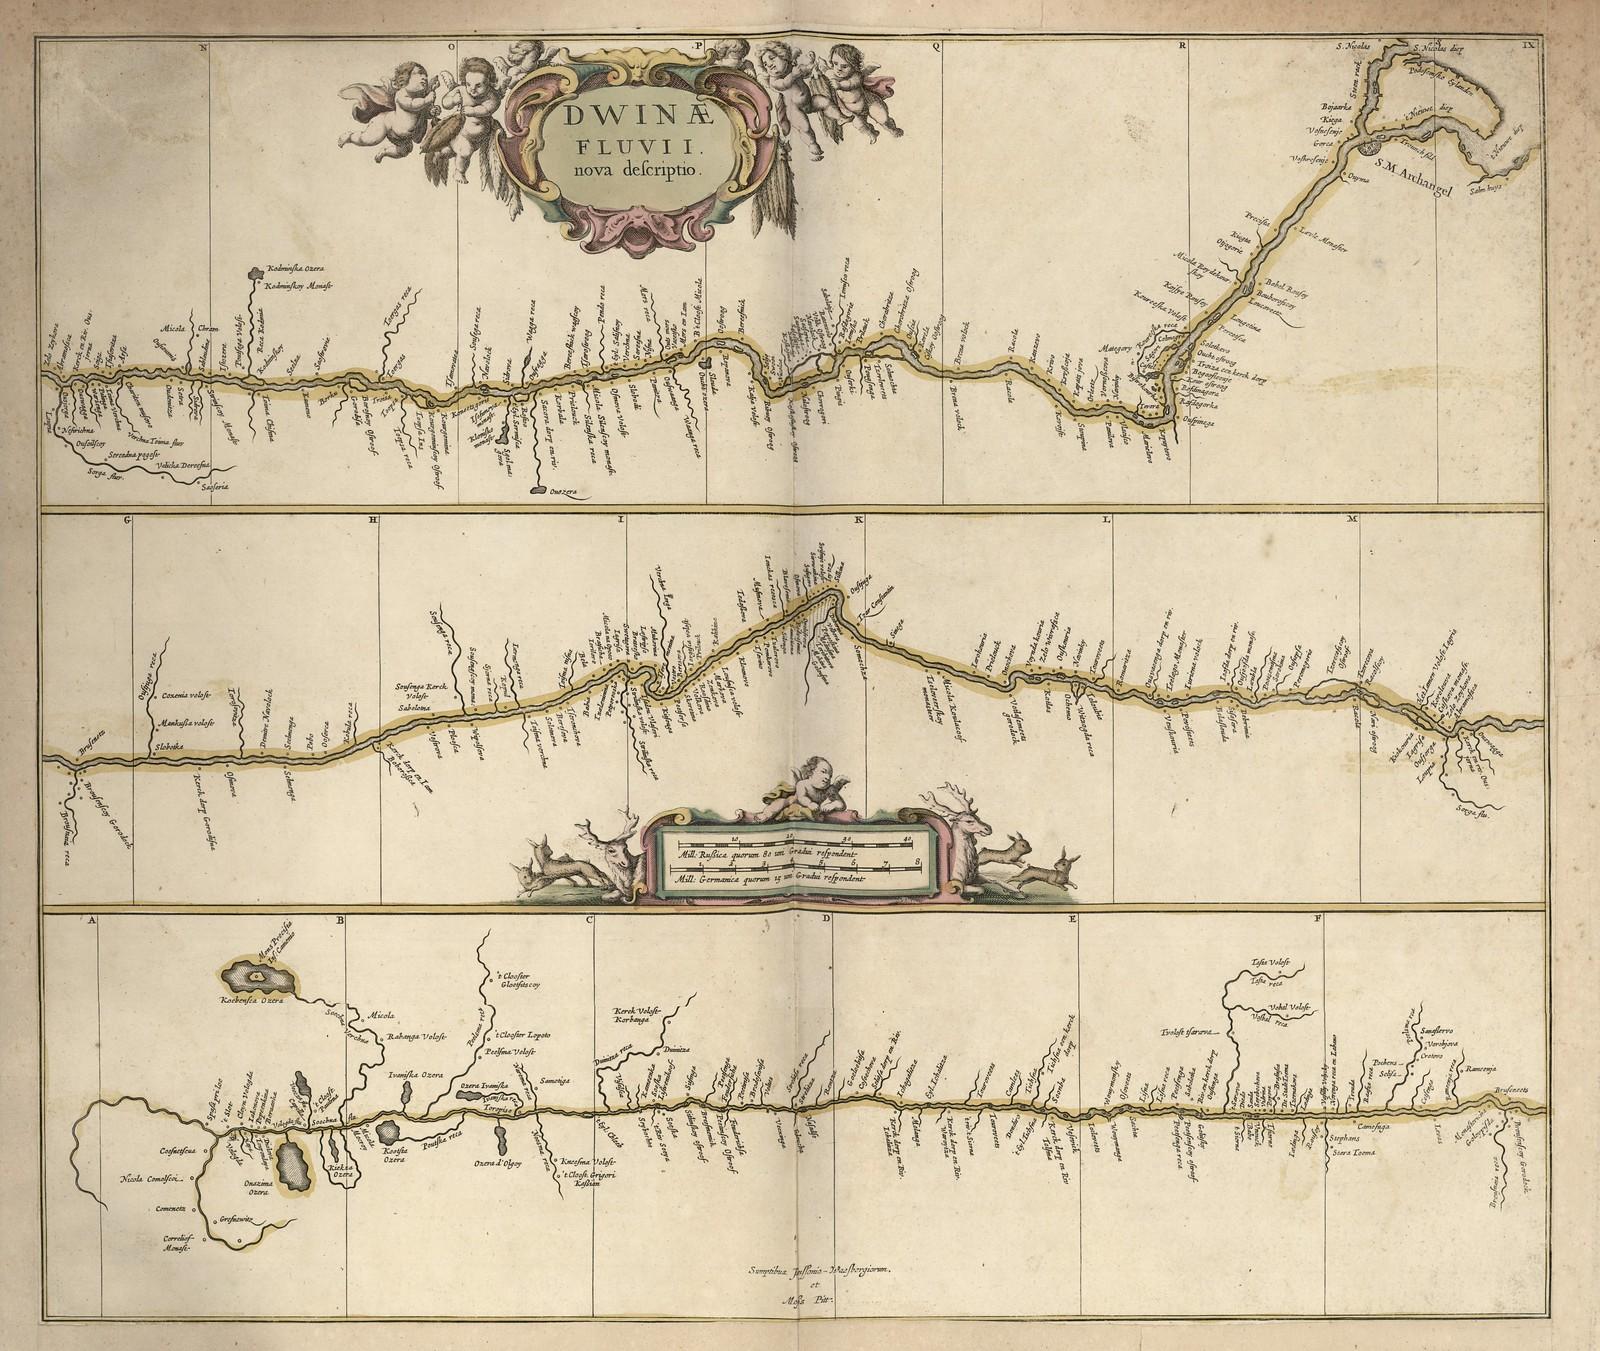 1680. Новое описание реки Двины, Мозес Васберген, Йоханнес ван Молл Питт, Голландия